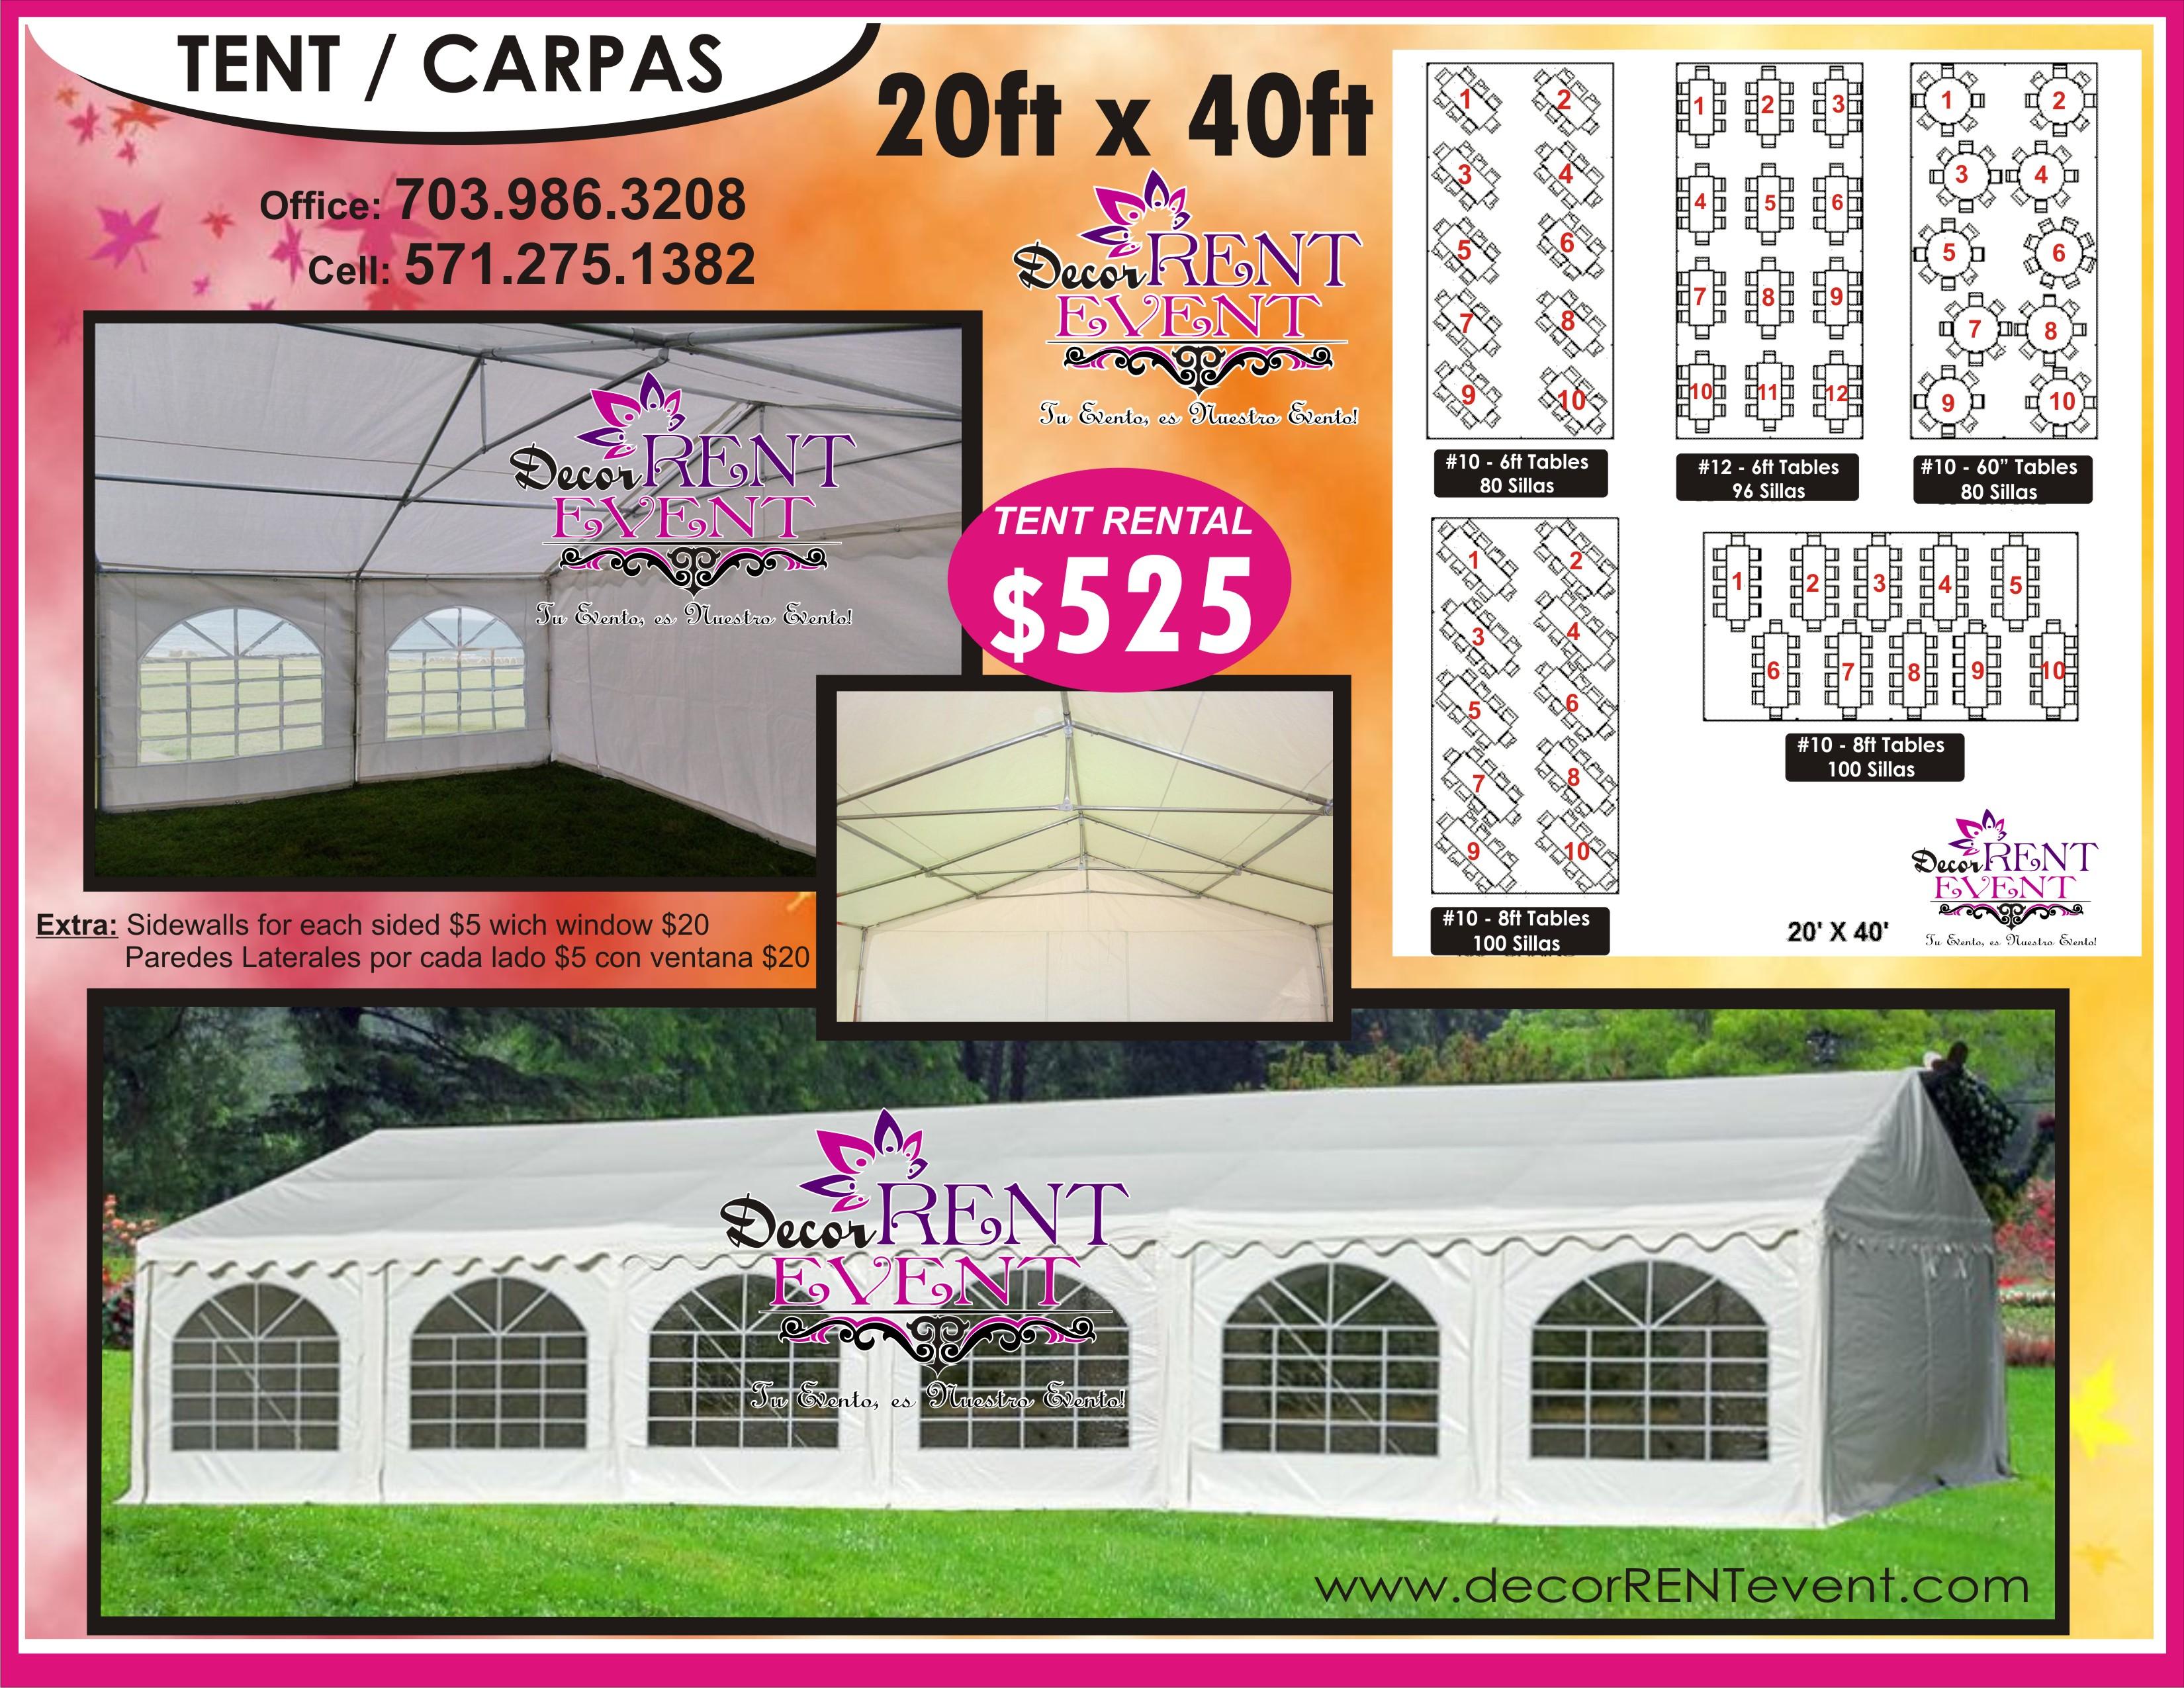 CARPAS 20X40